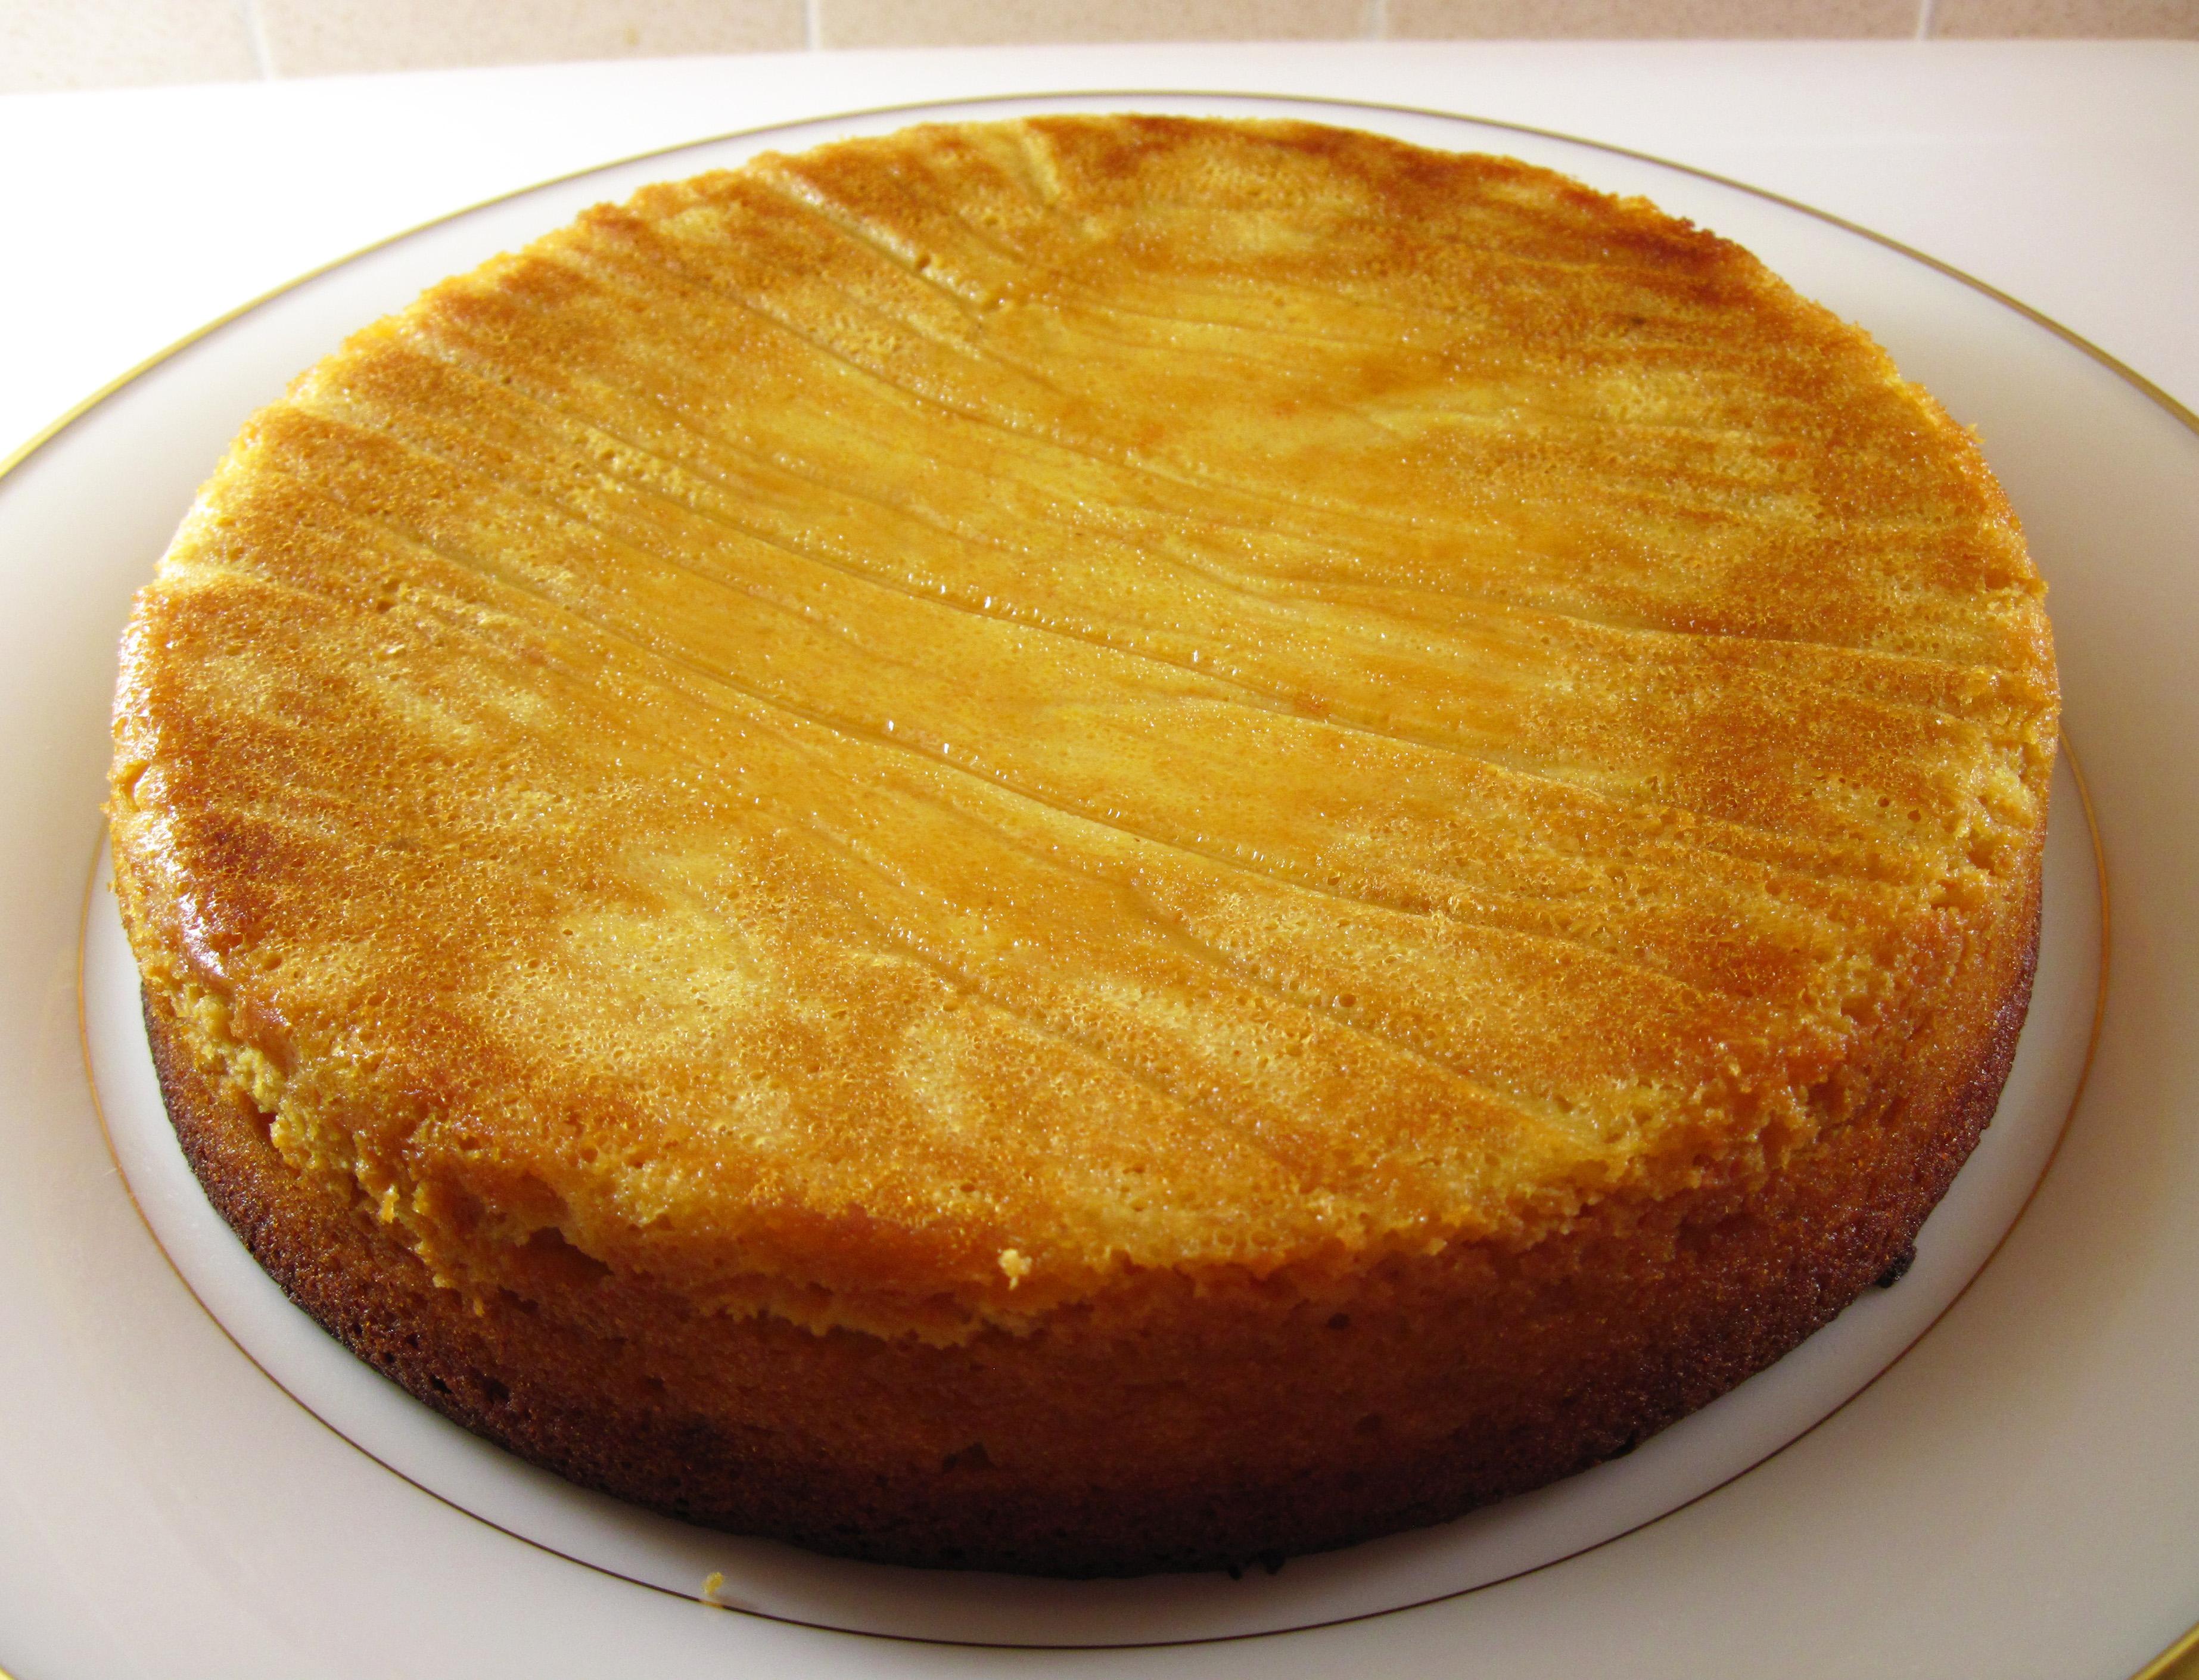 ... cake flourless nutella cake flourless flourless orange saffron cake